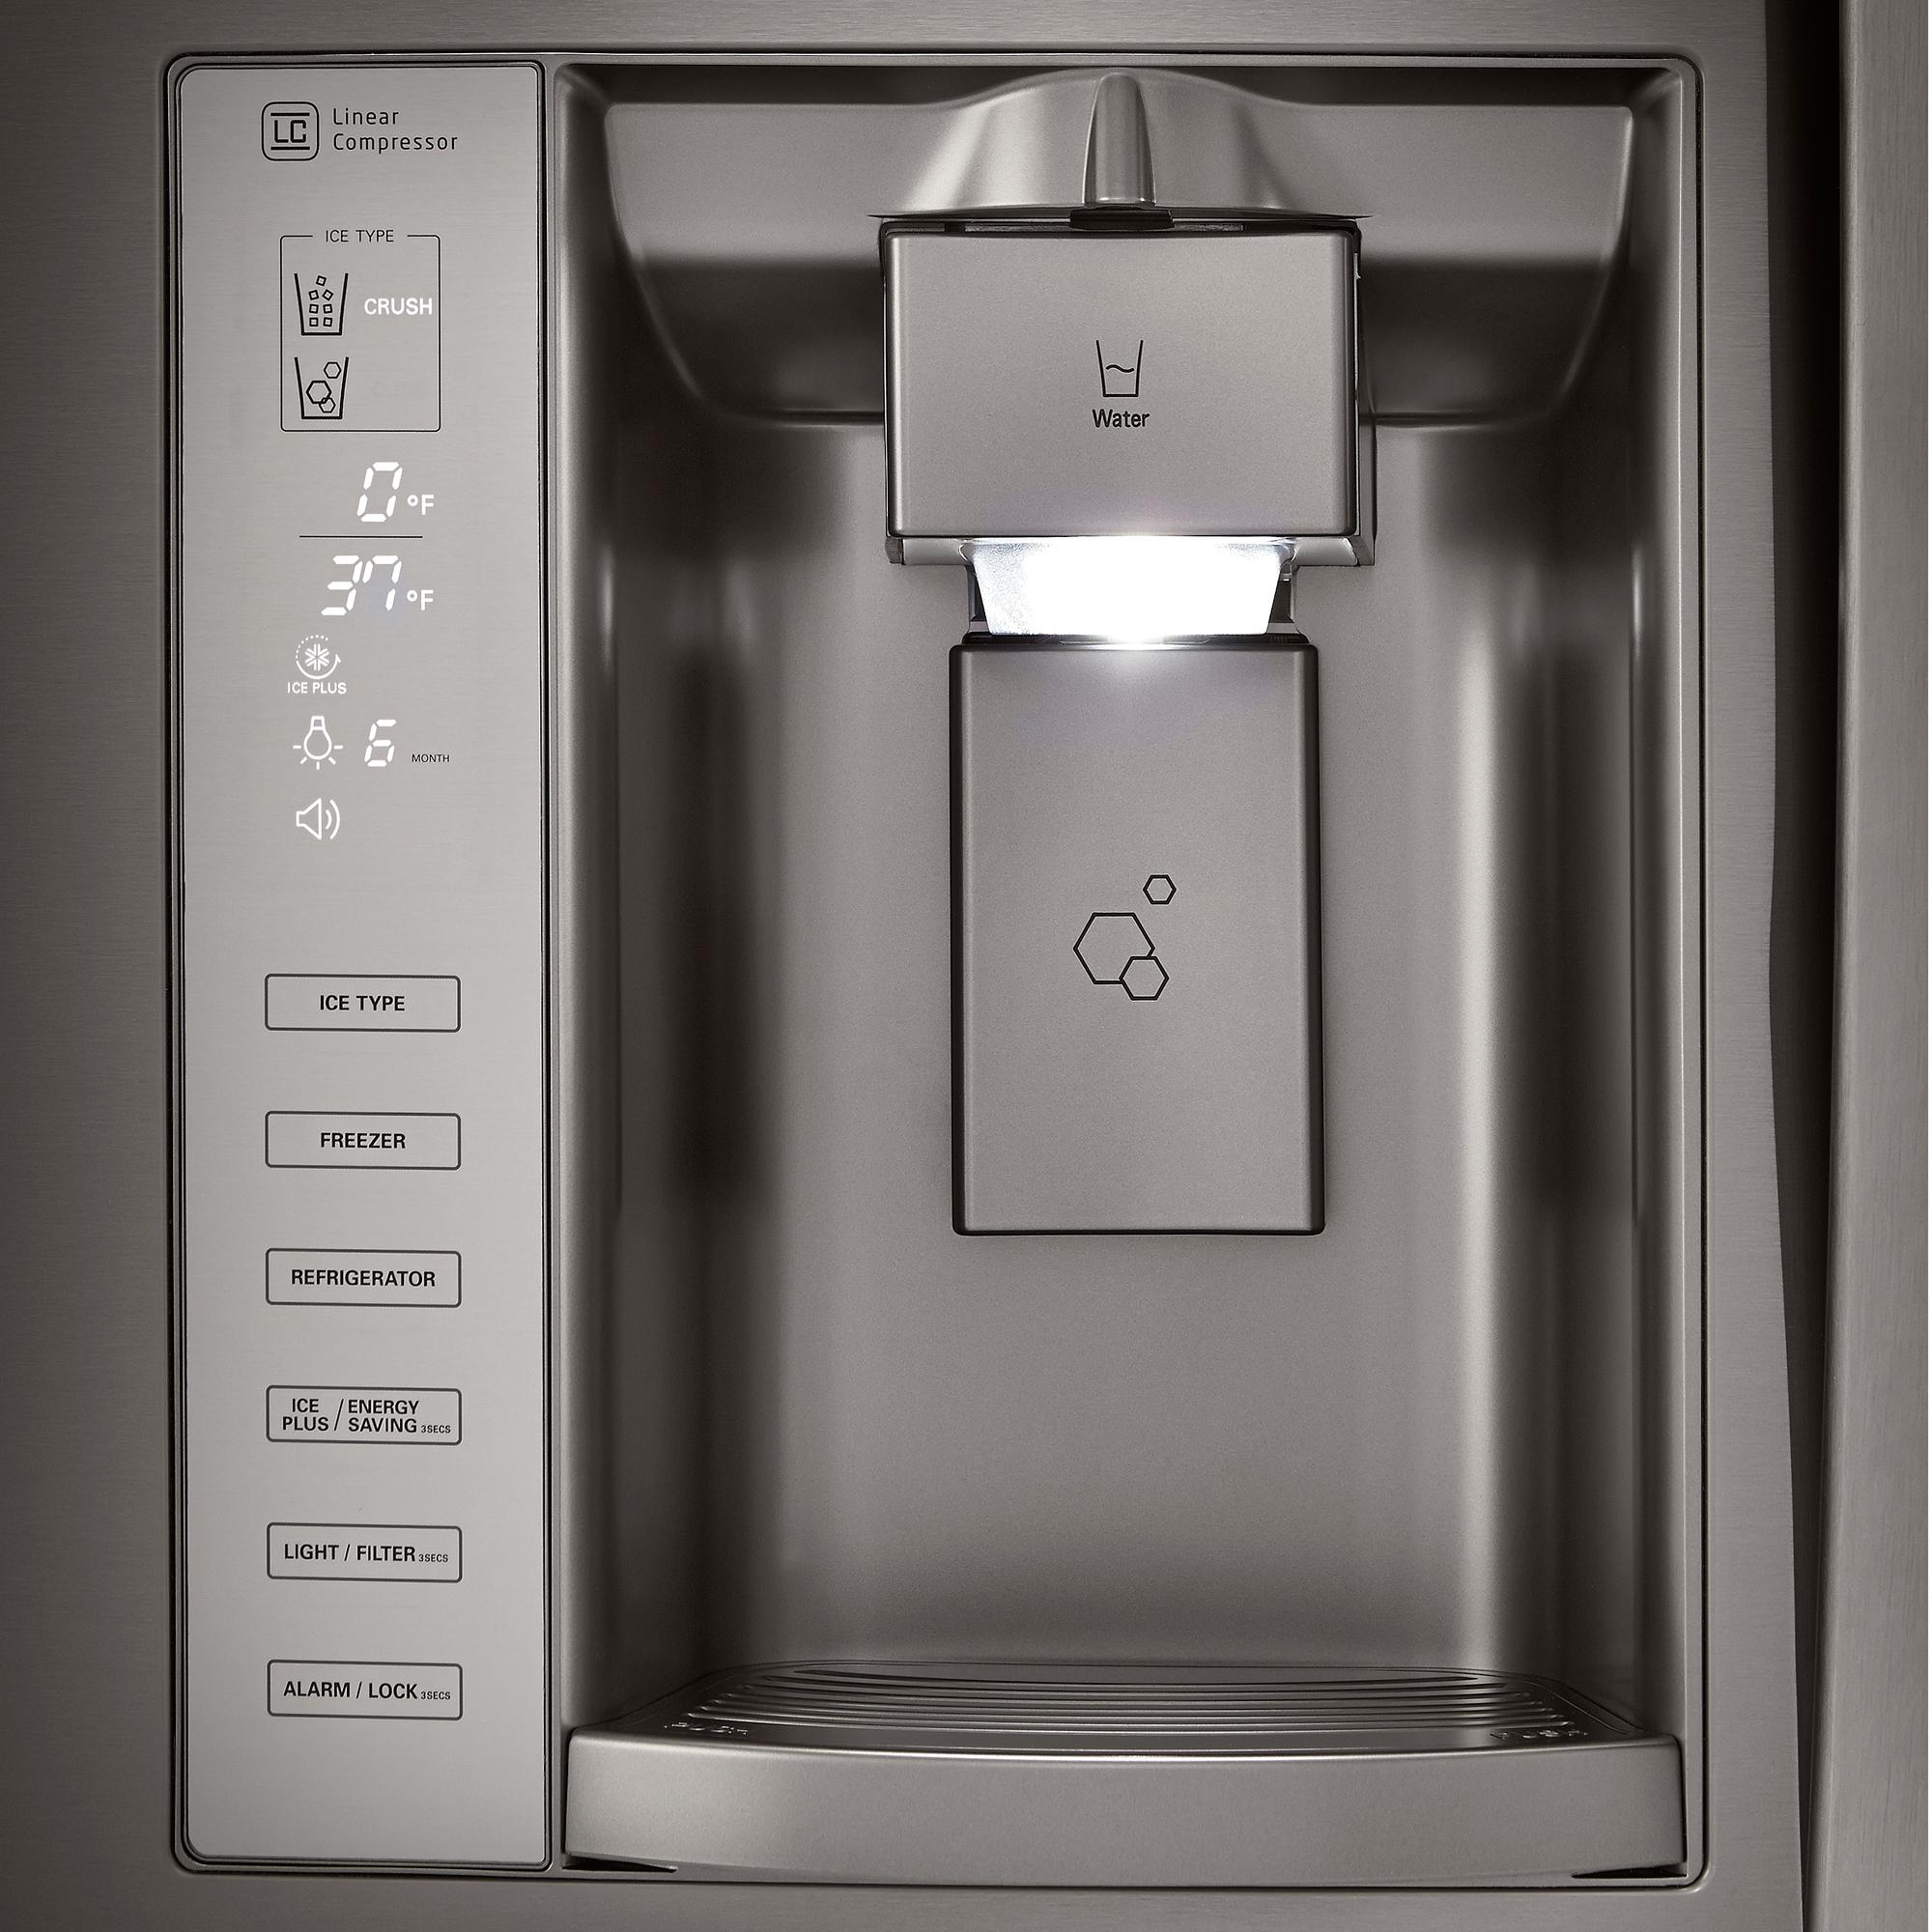 LG LFX25973D 24.1 cu. ft. French Door Bottom-Freezer Refrigerator w/Dual Ice-Maker – Black Stainless